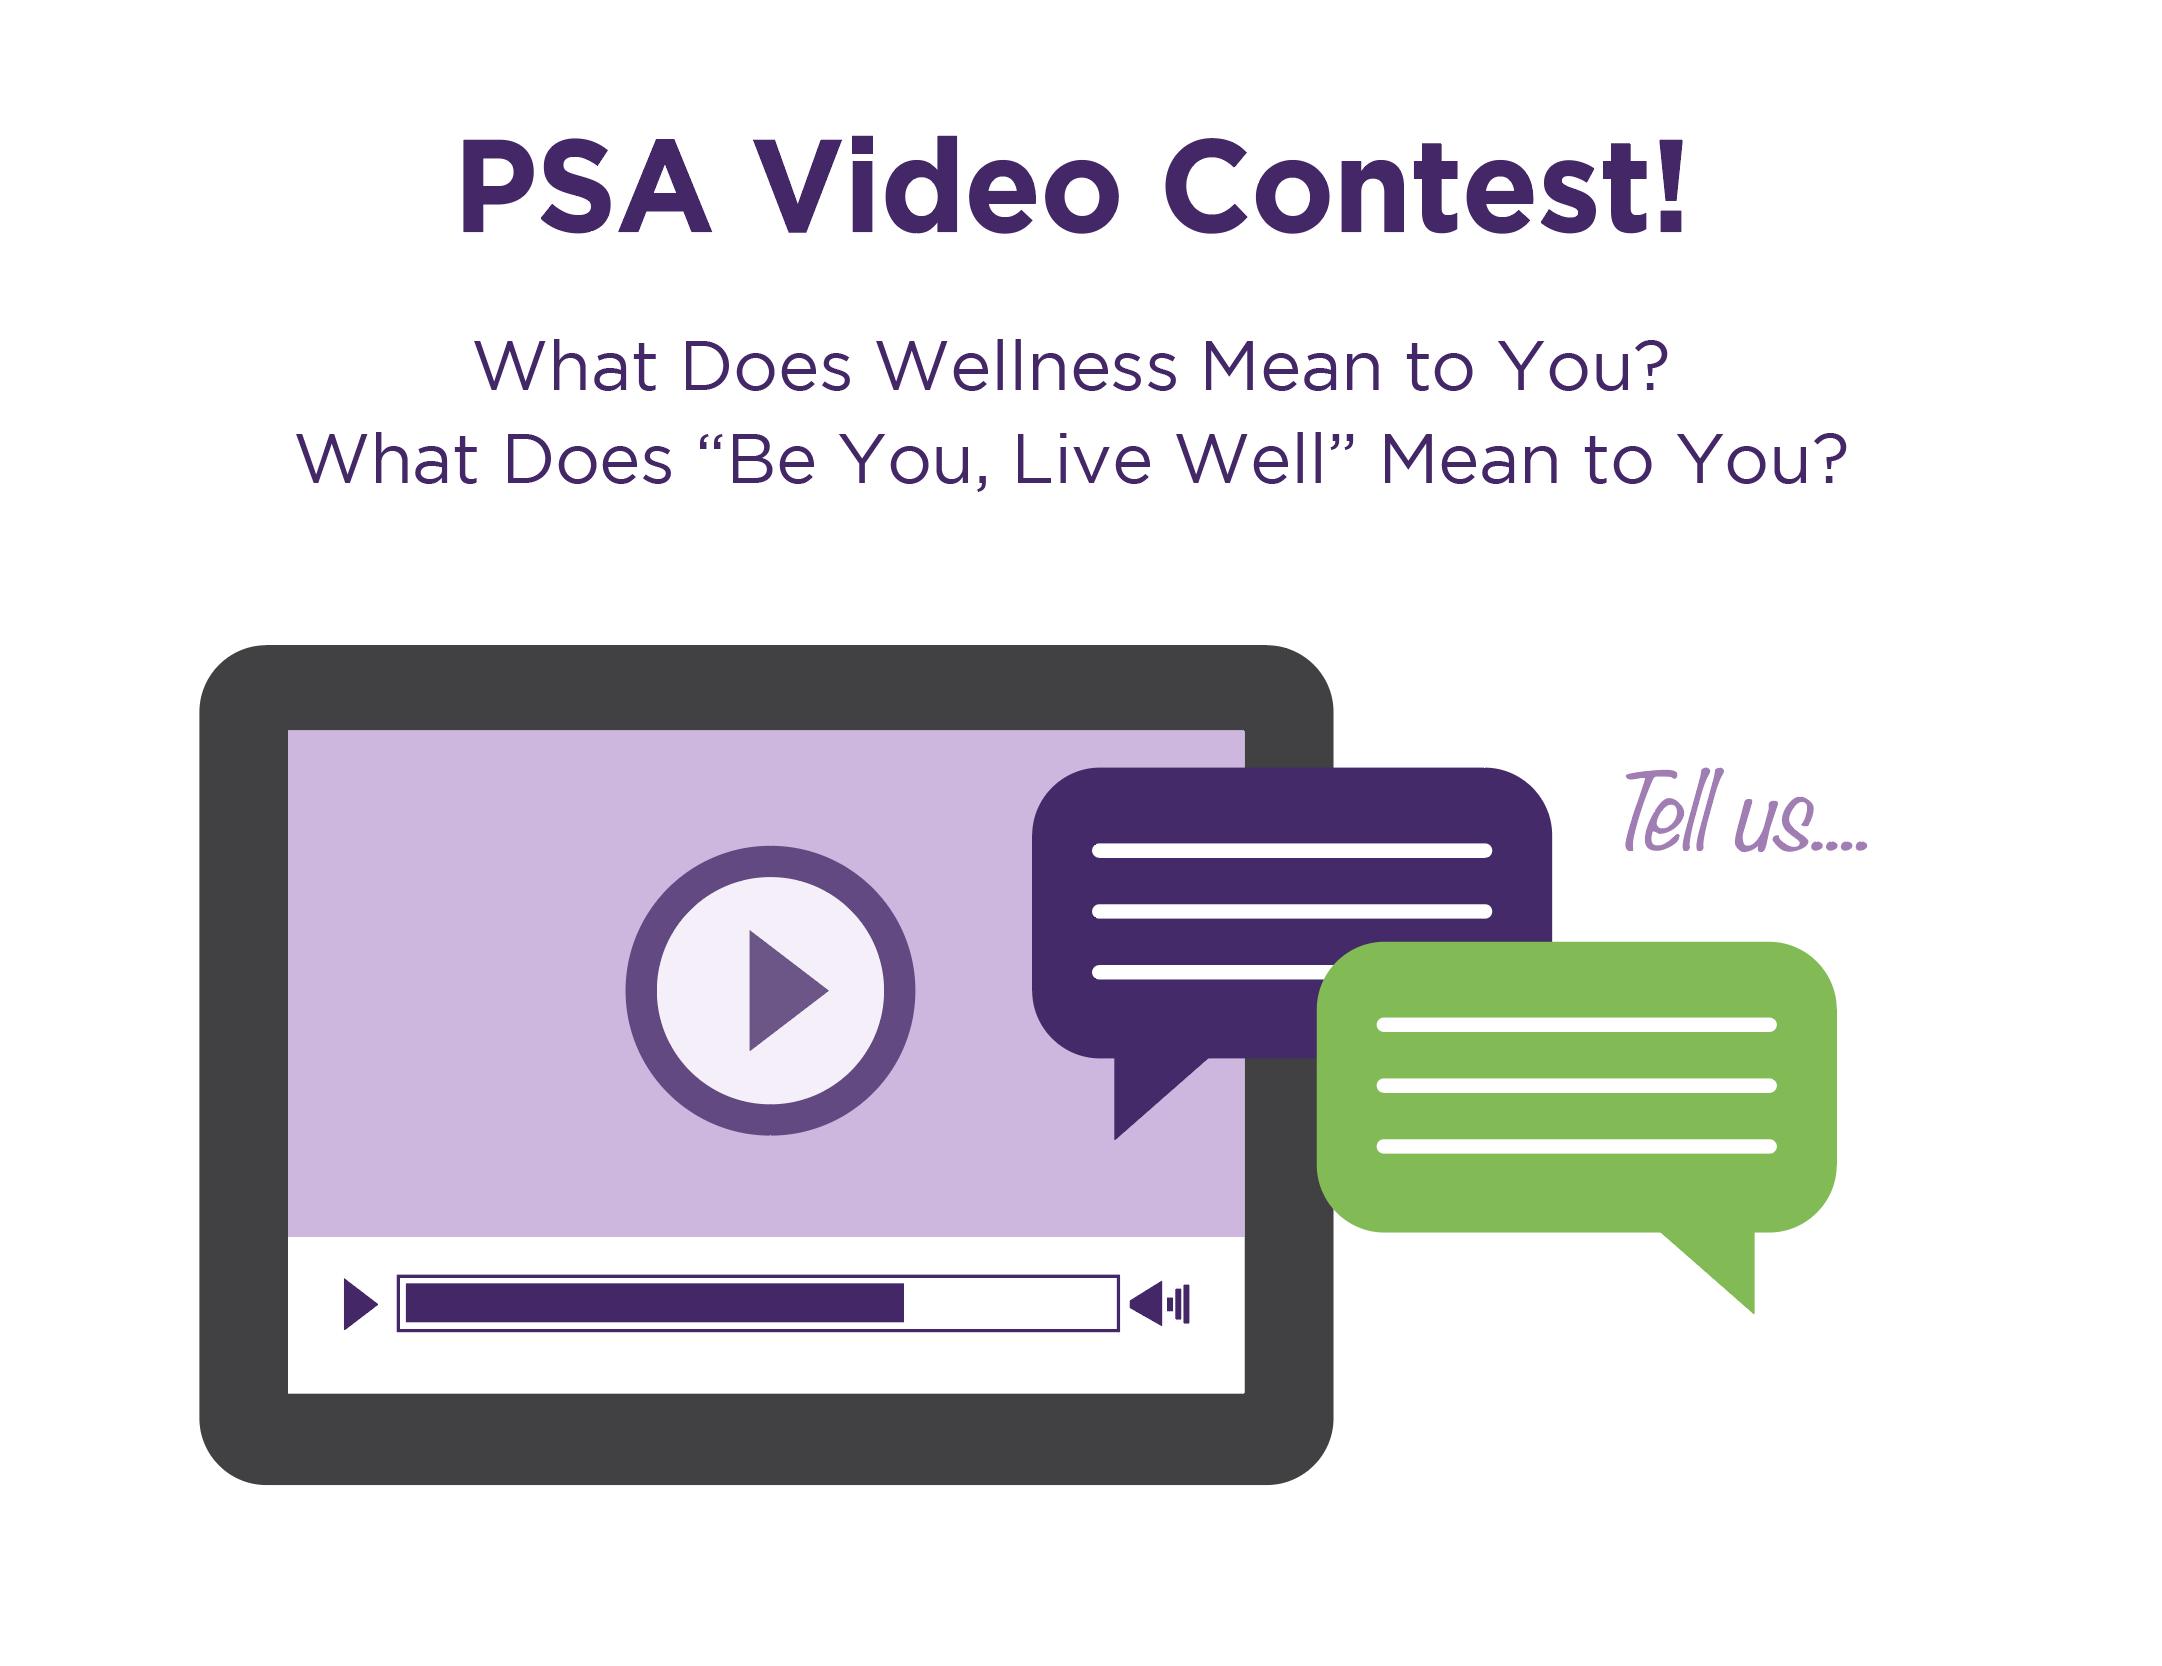 PSA Video Contest